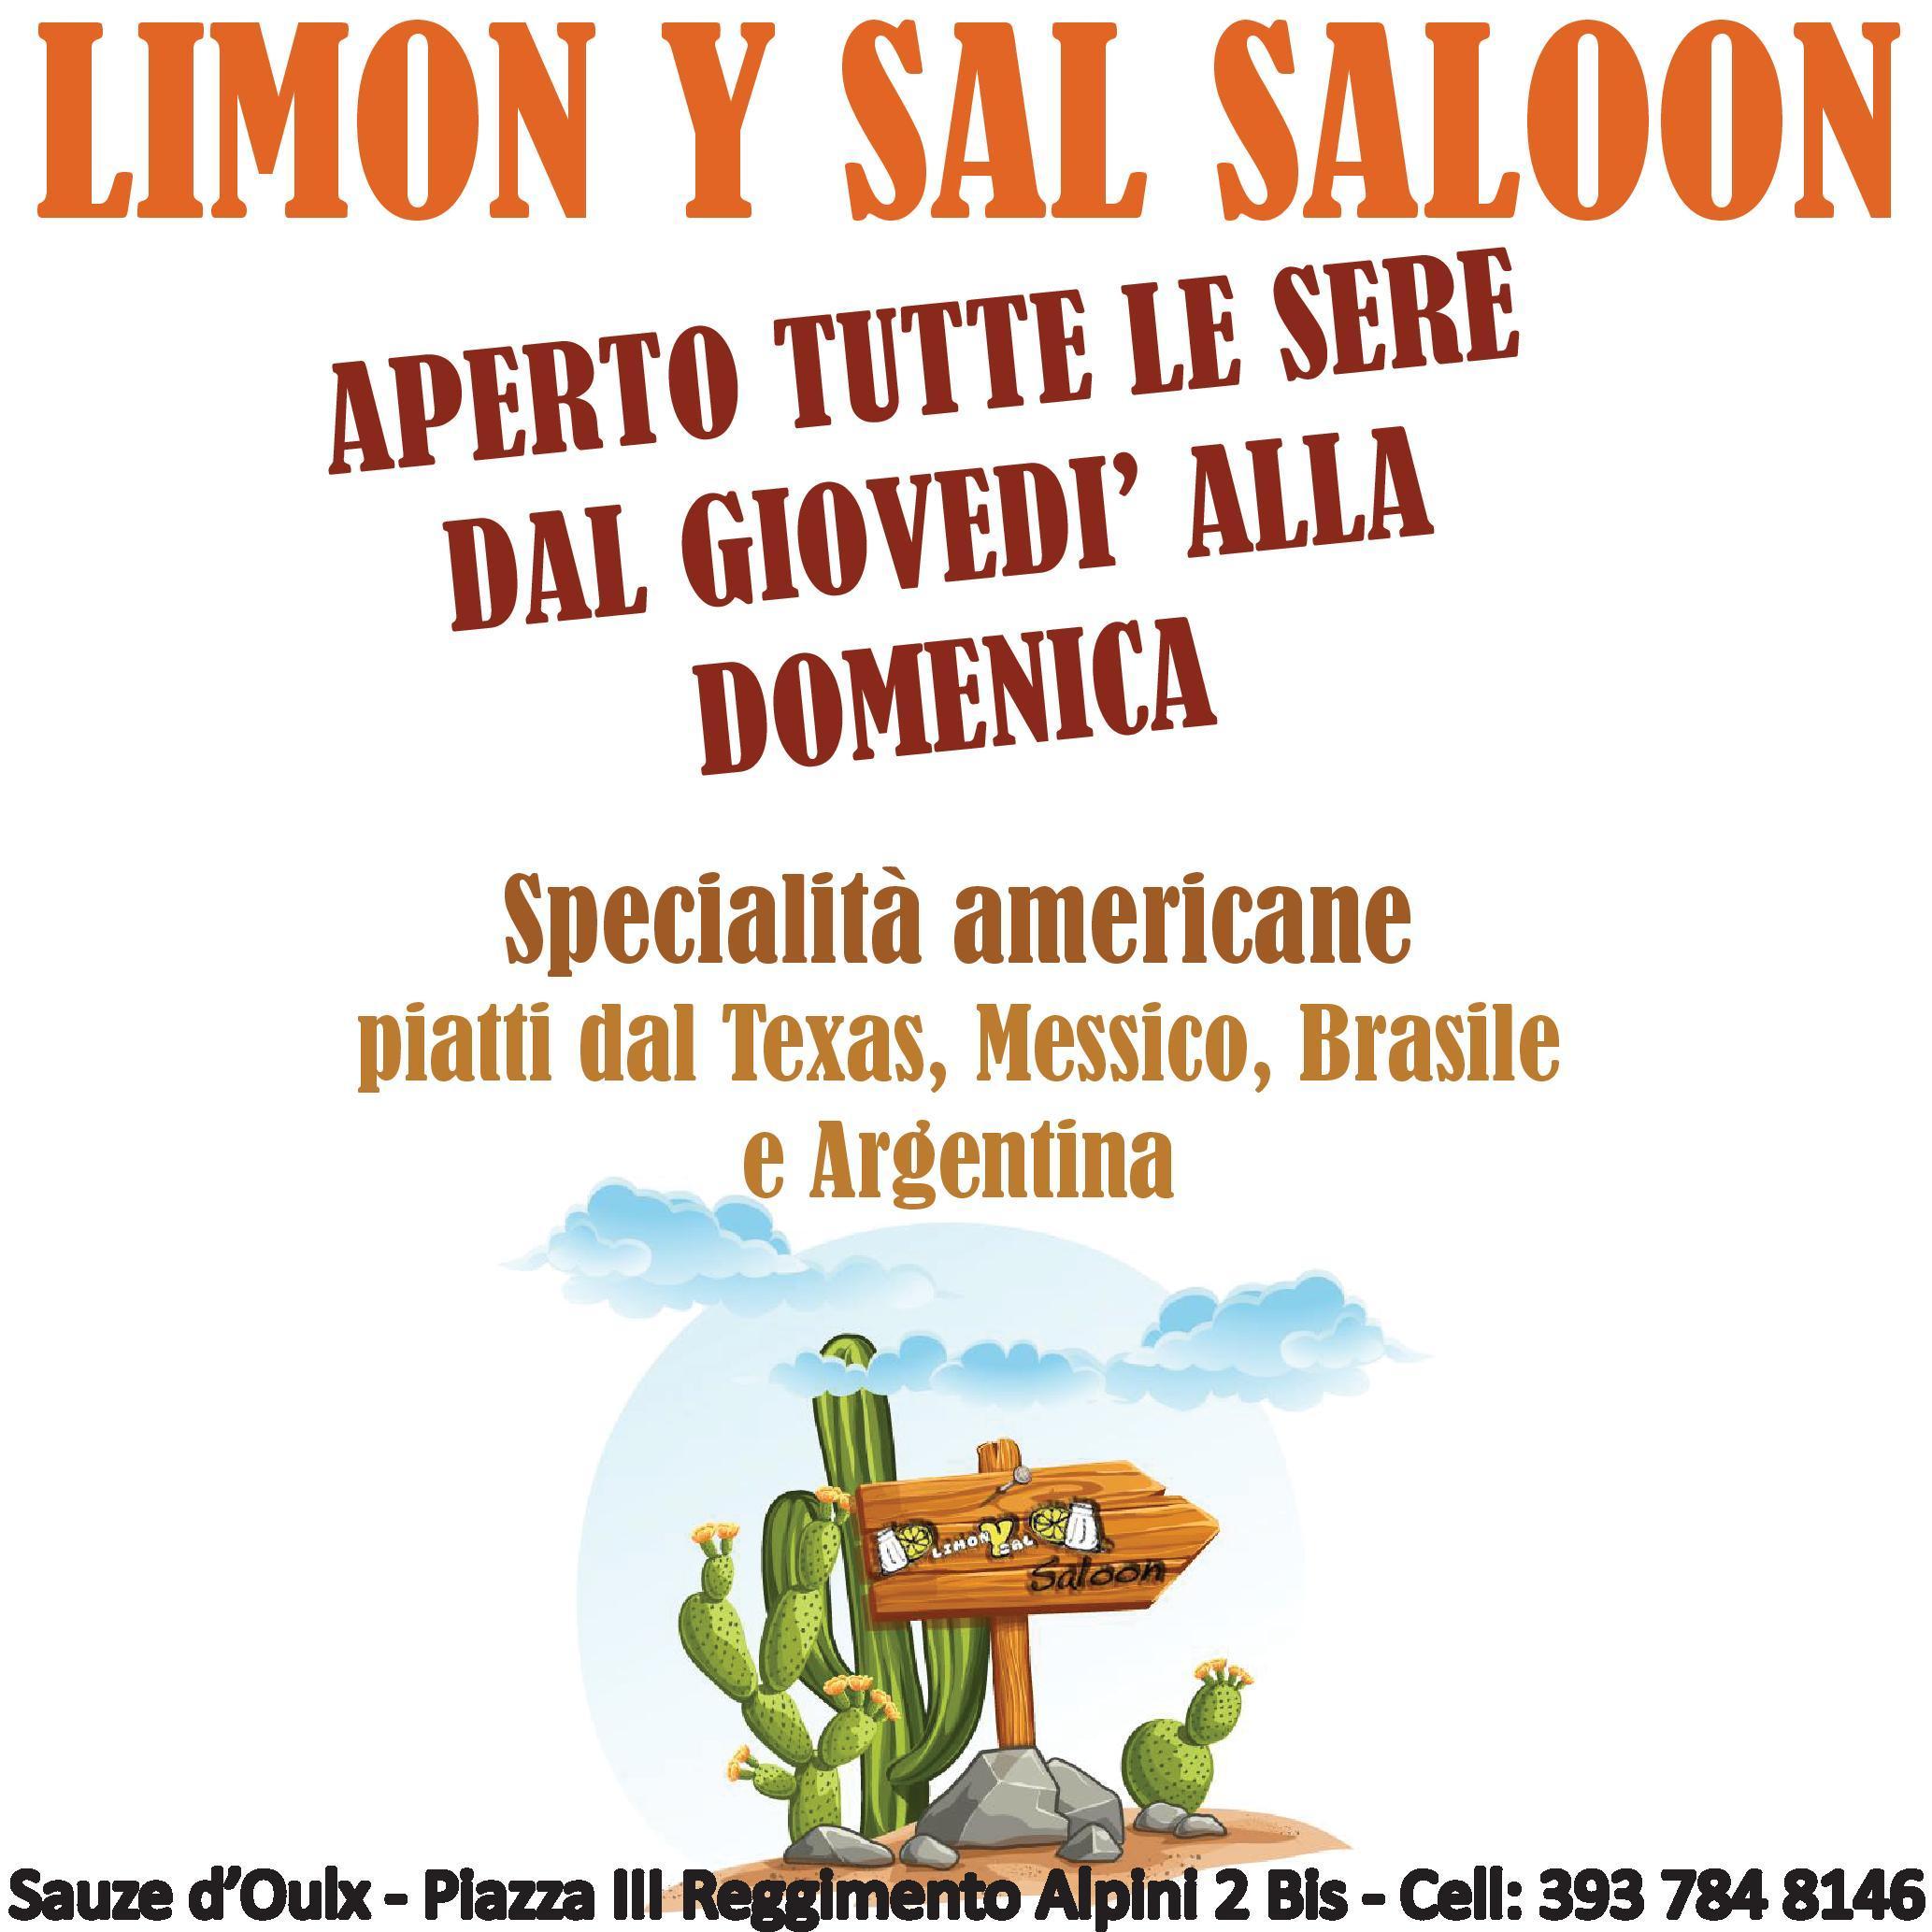 limon y sal